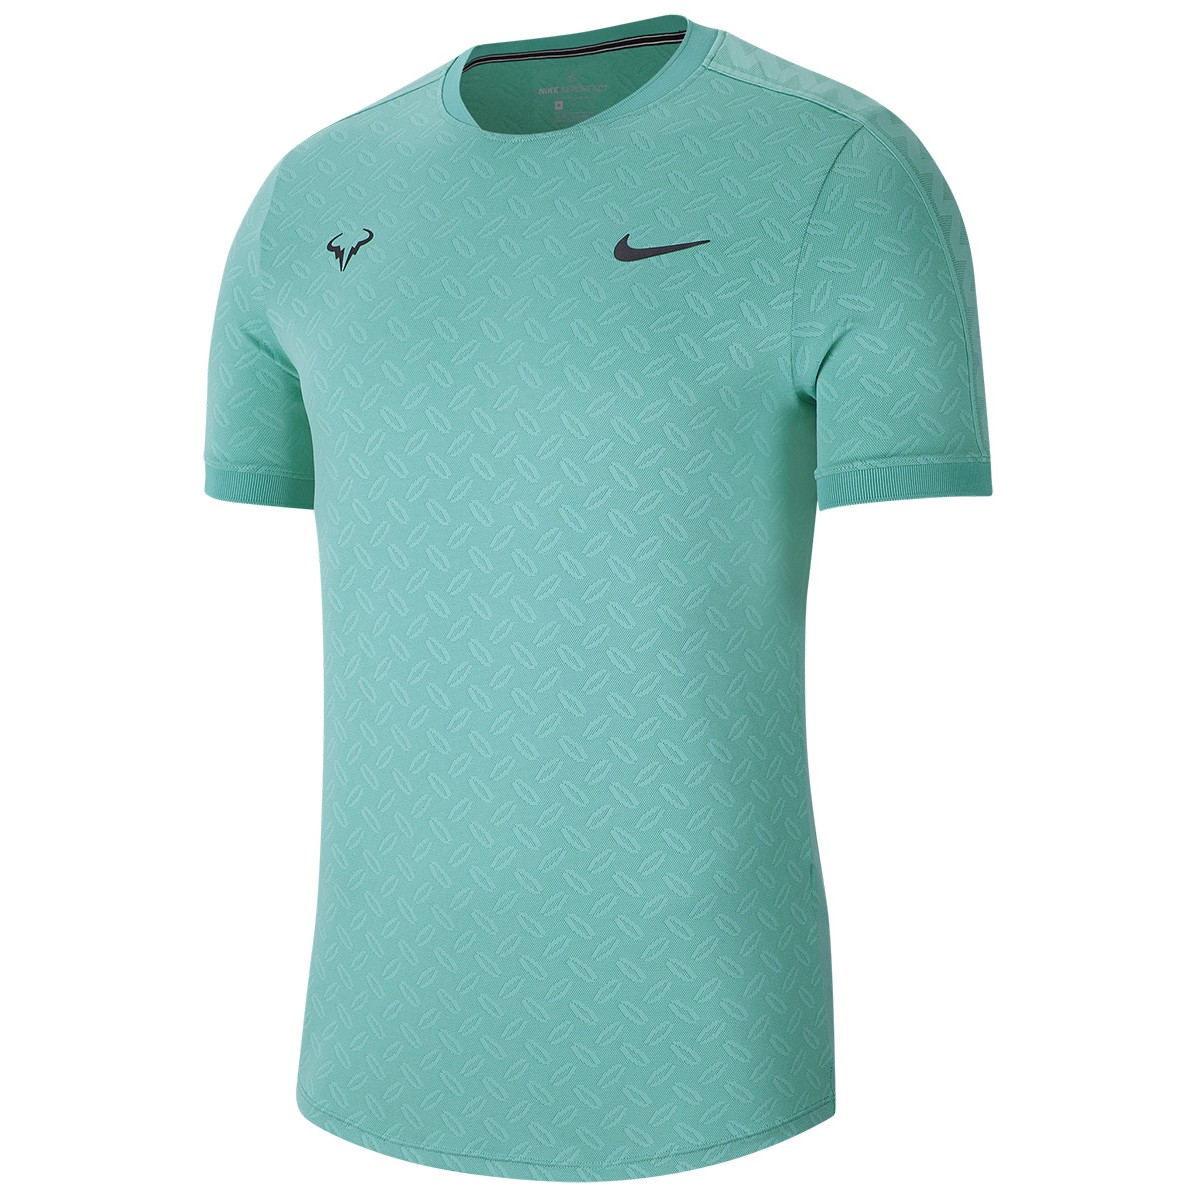 Camiseta Sin Mangas Nike Aeroreact Rafa Para Hombre Original